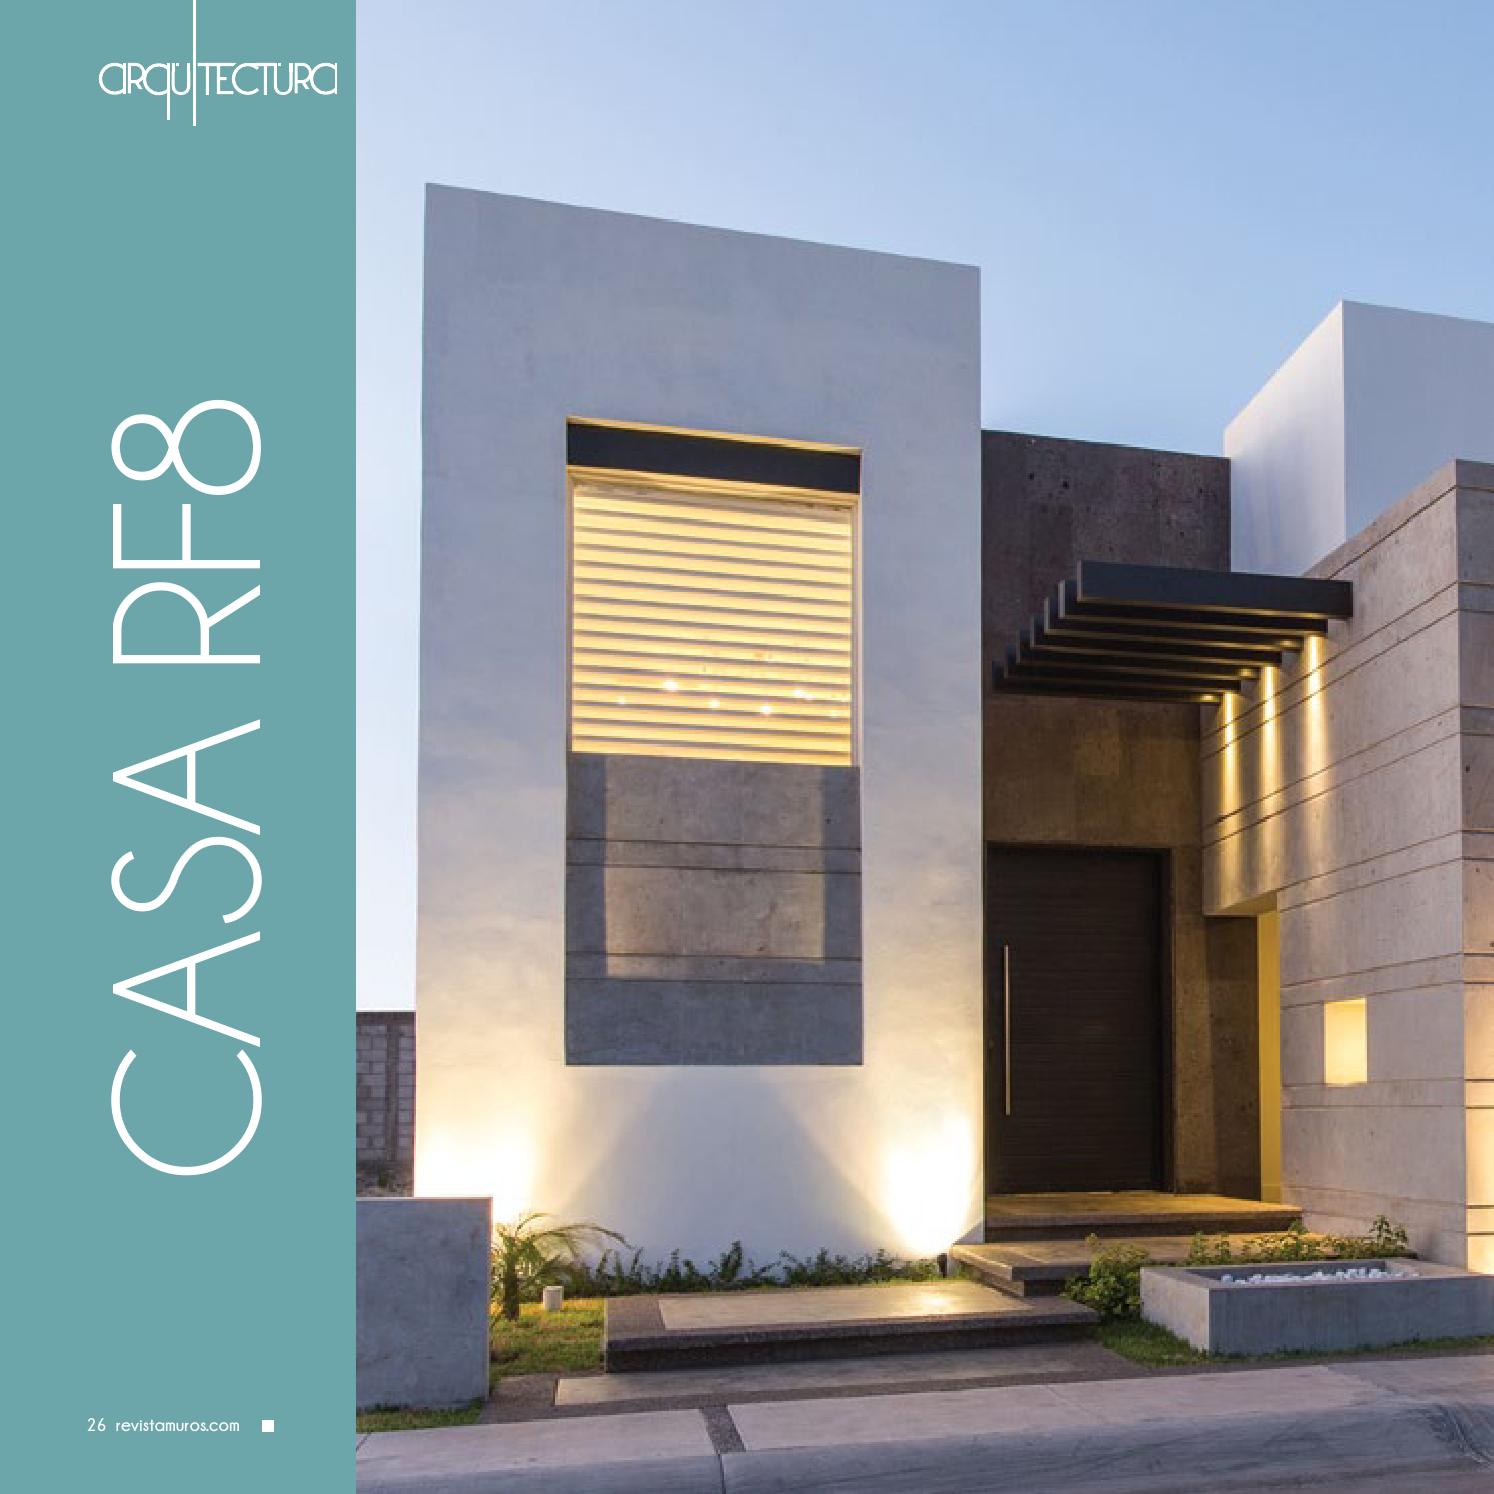 Edici n 17 revista muros arquitectura dise o Arte arquitectura y diseno definicion